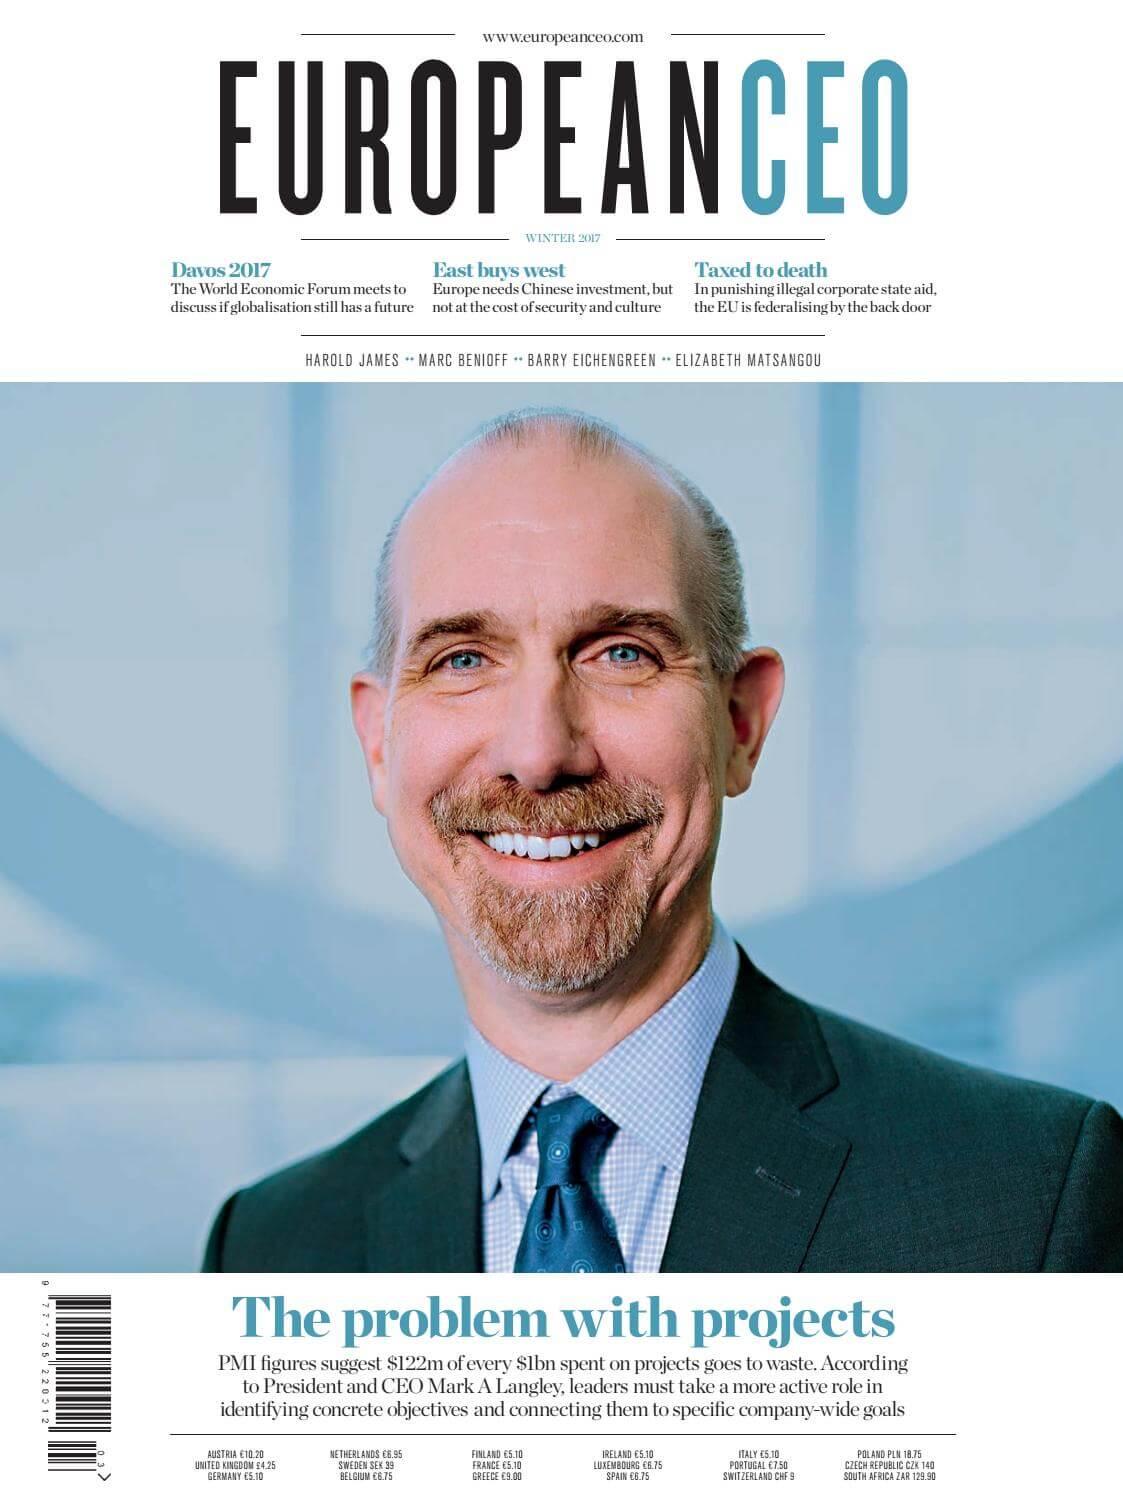 European CEO Magazine, Winter 2017